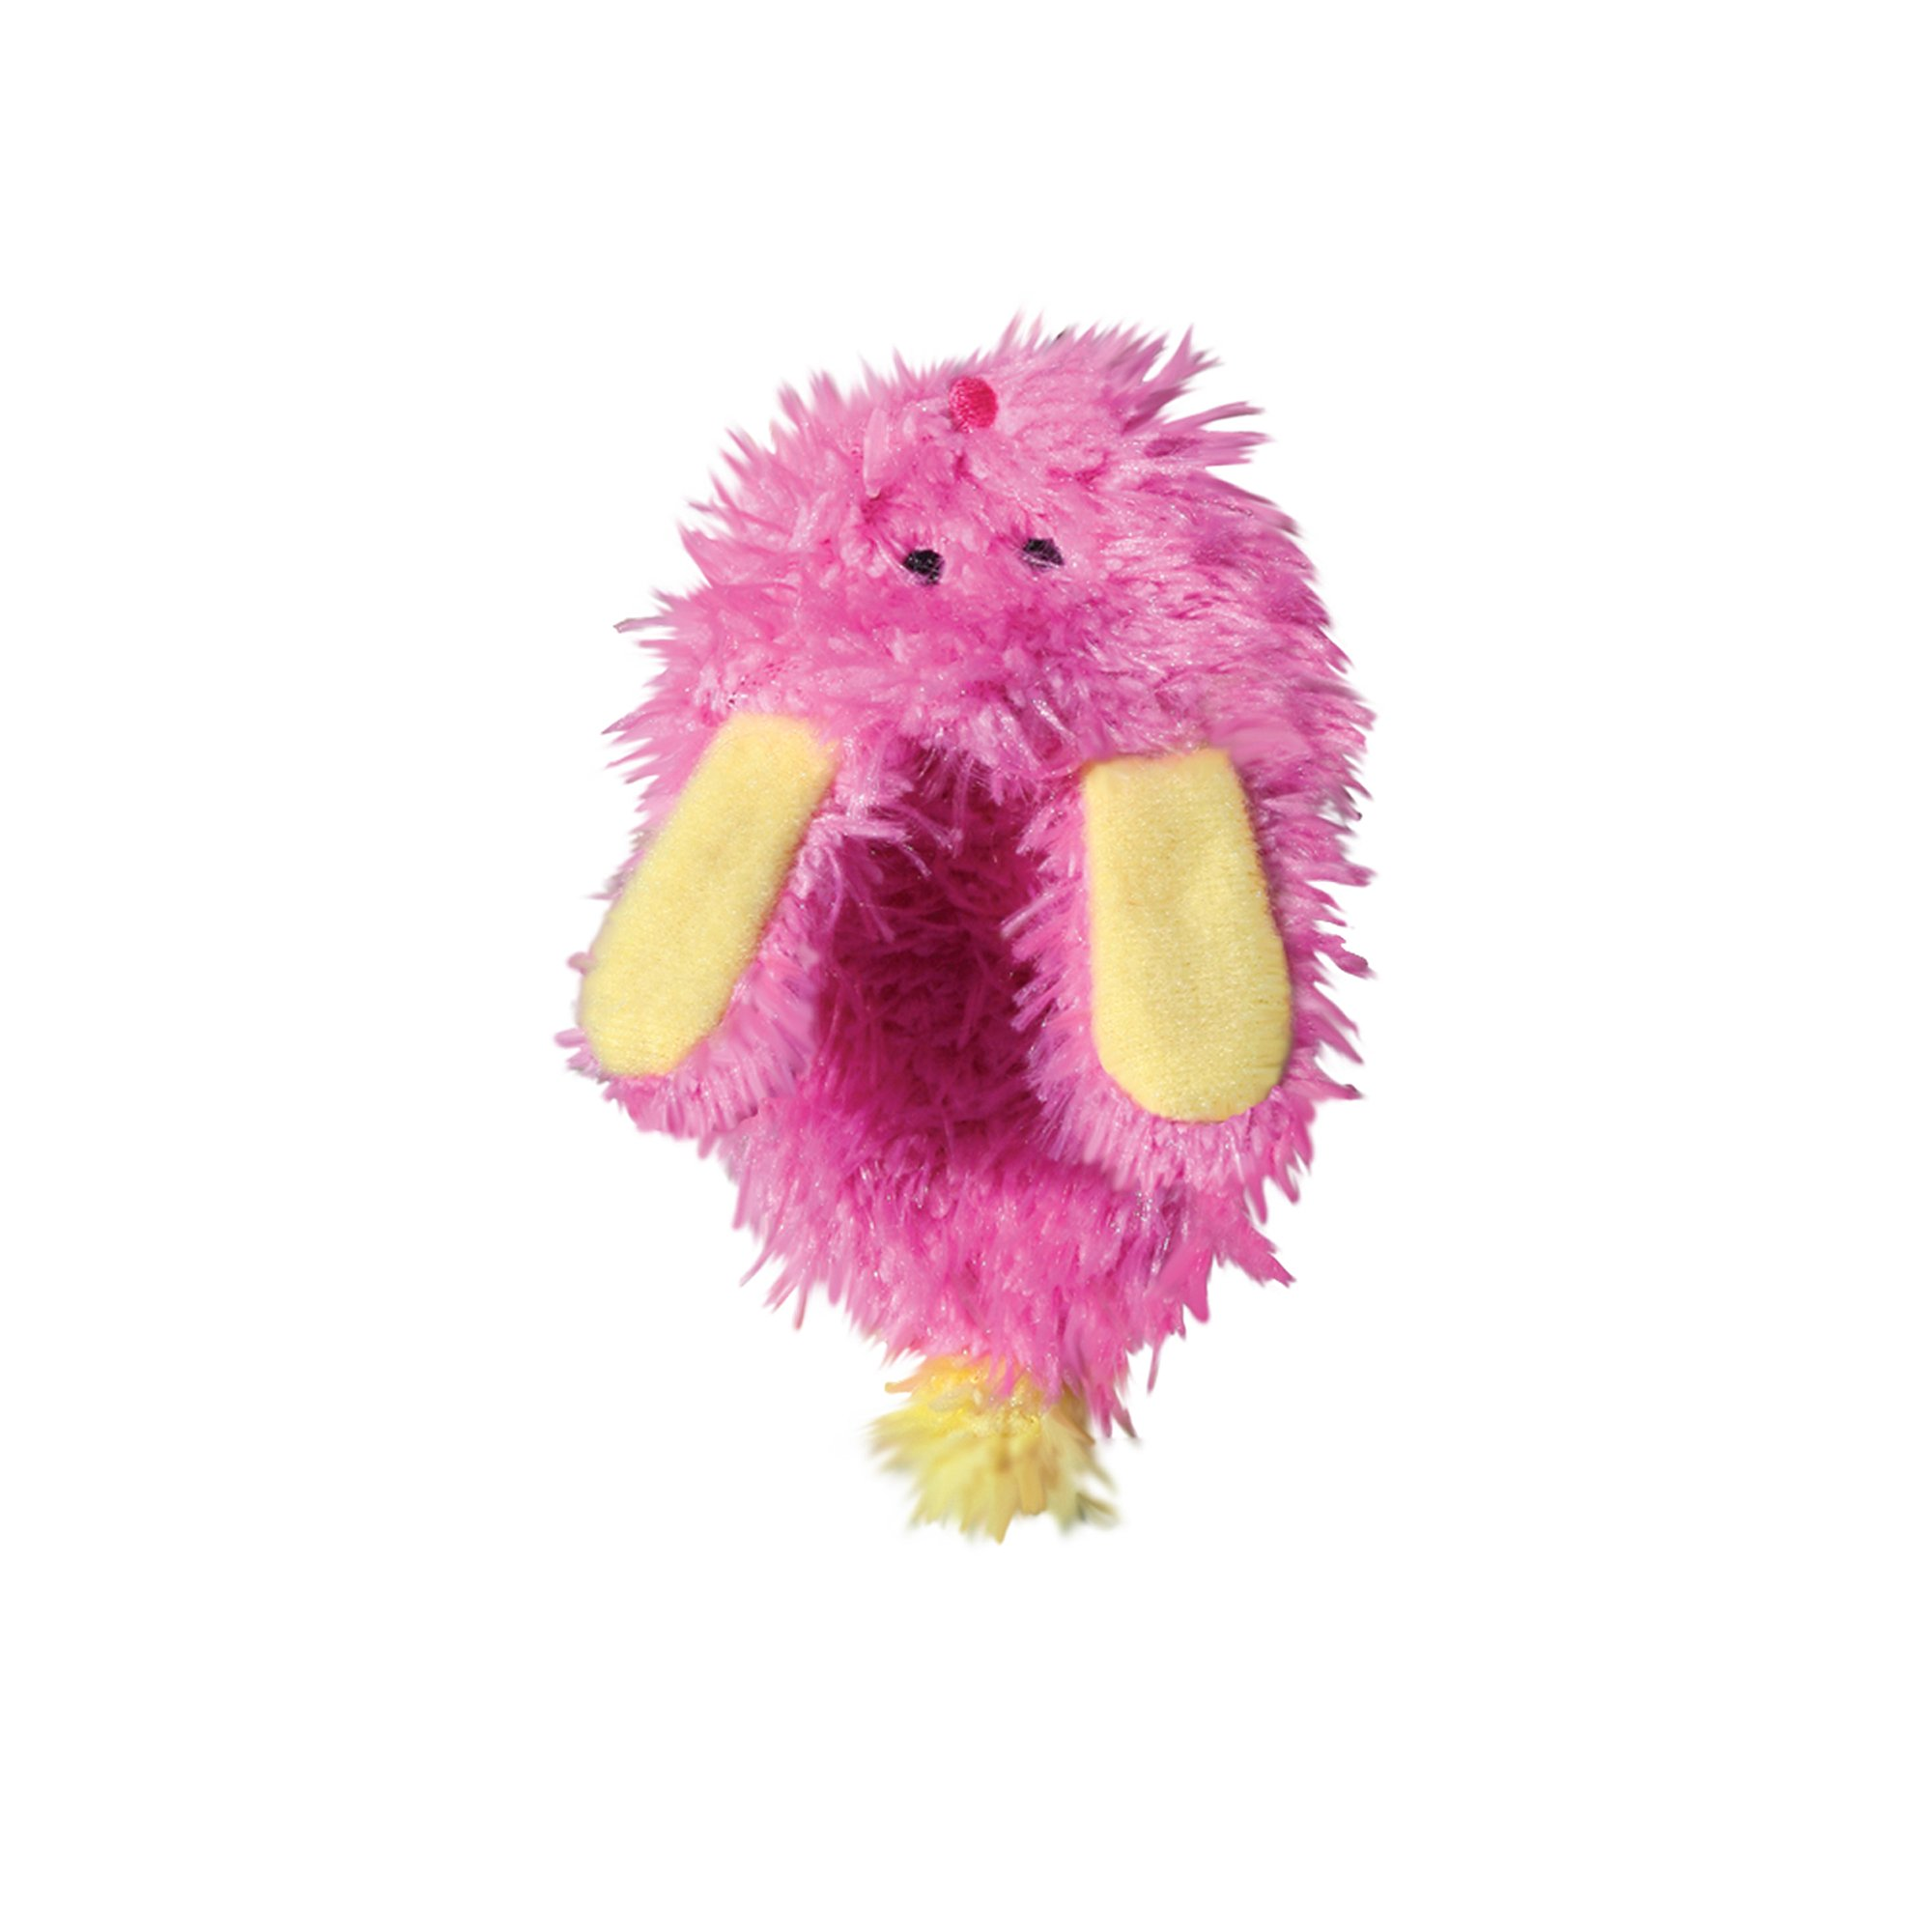 KONG Refillables Fuzzy Slipper Catnip Cat Toy